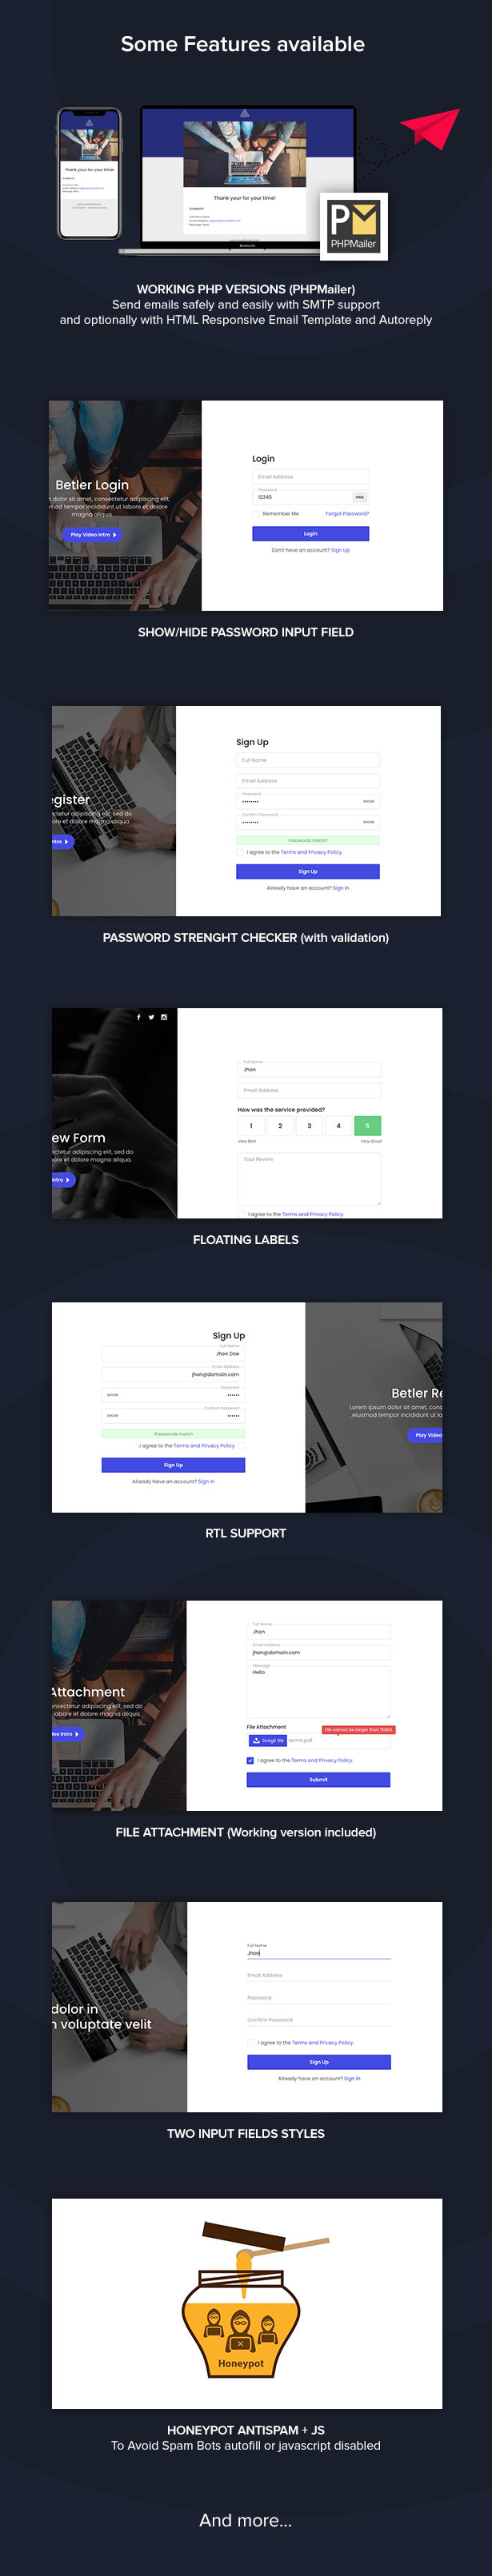 Betler Multipurpose Forms HTML Template